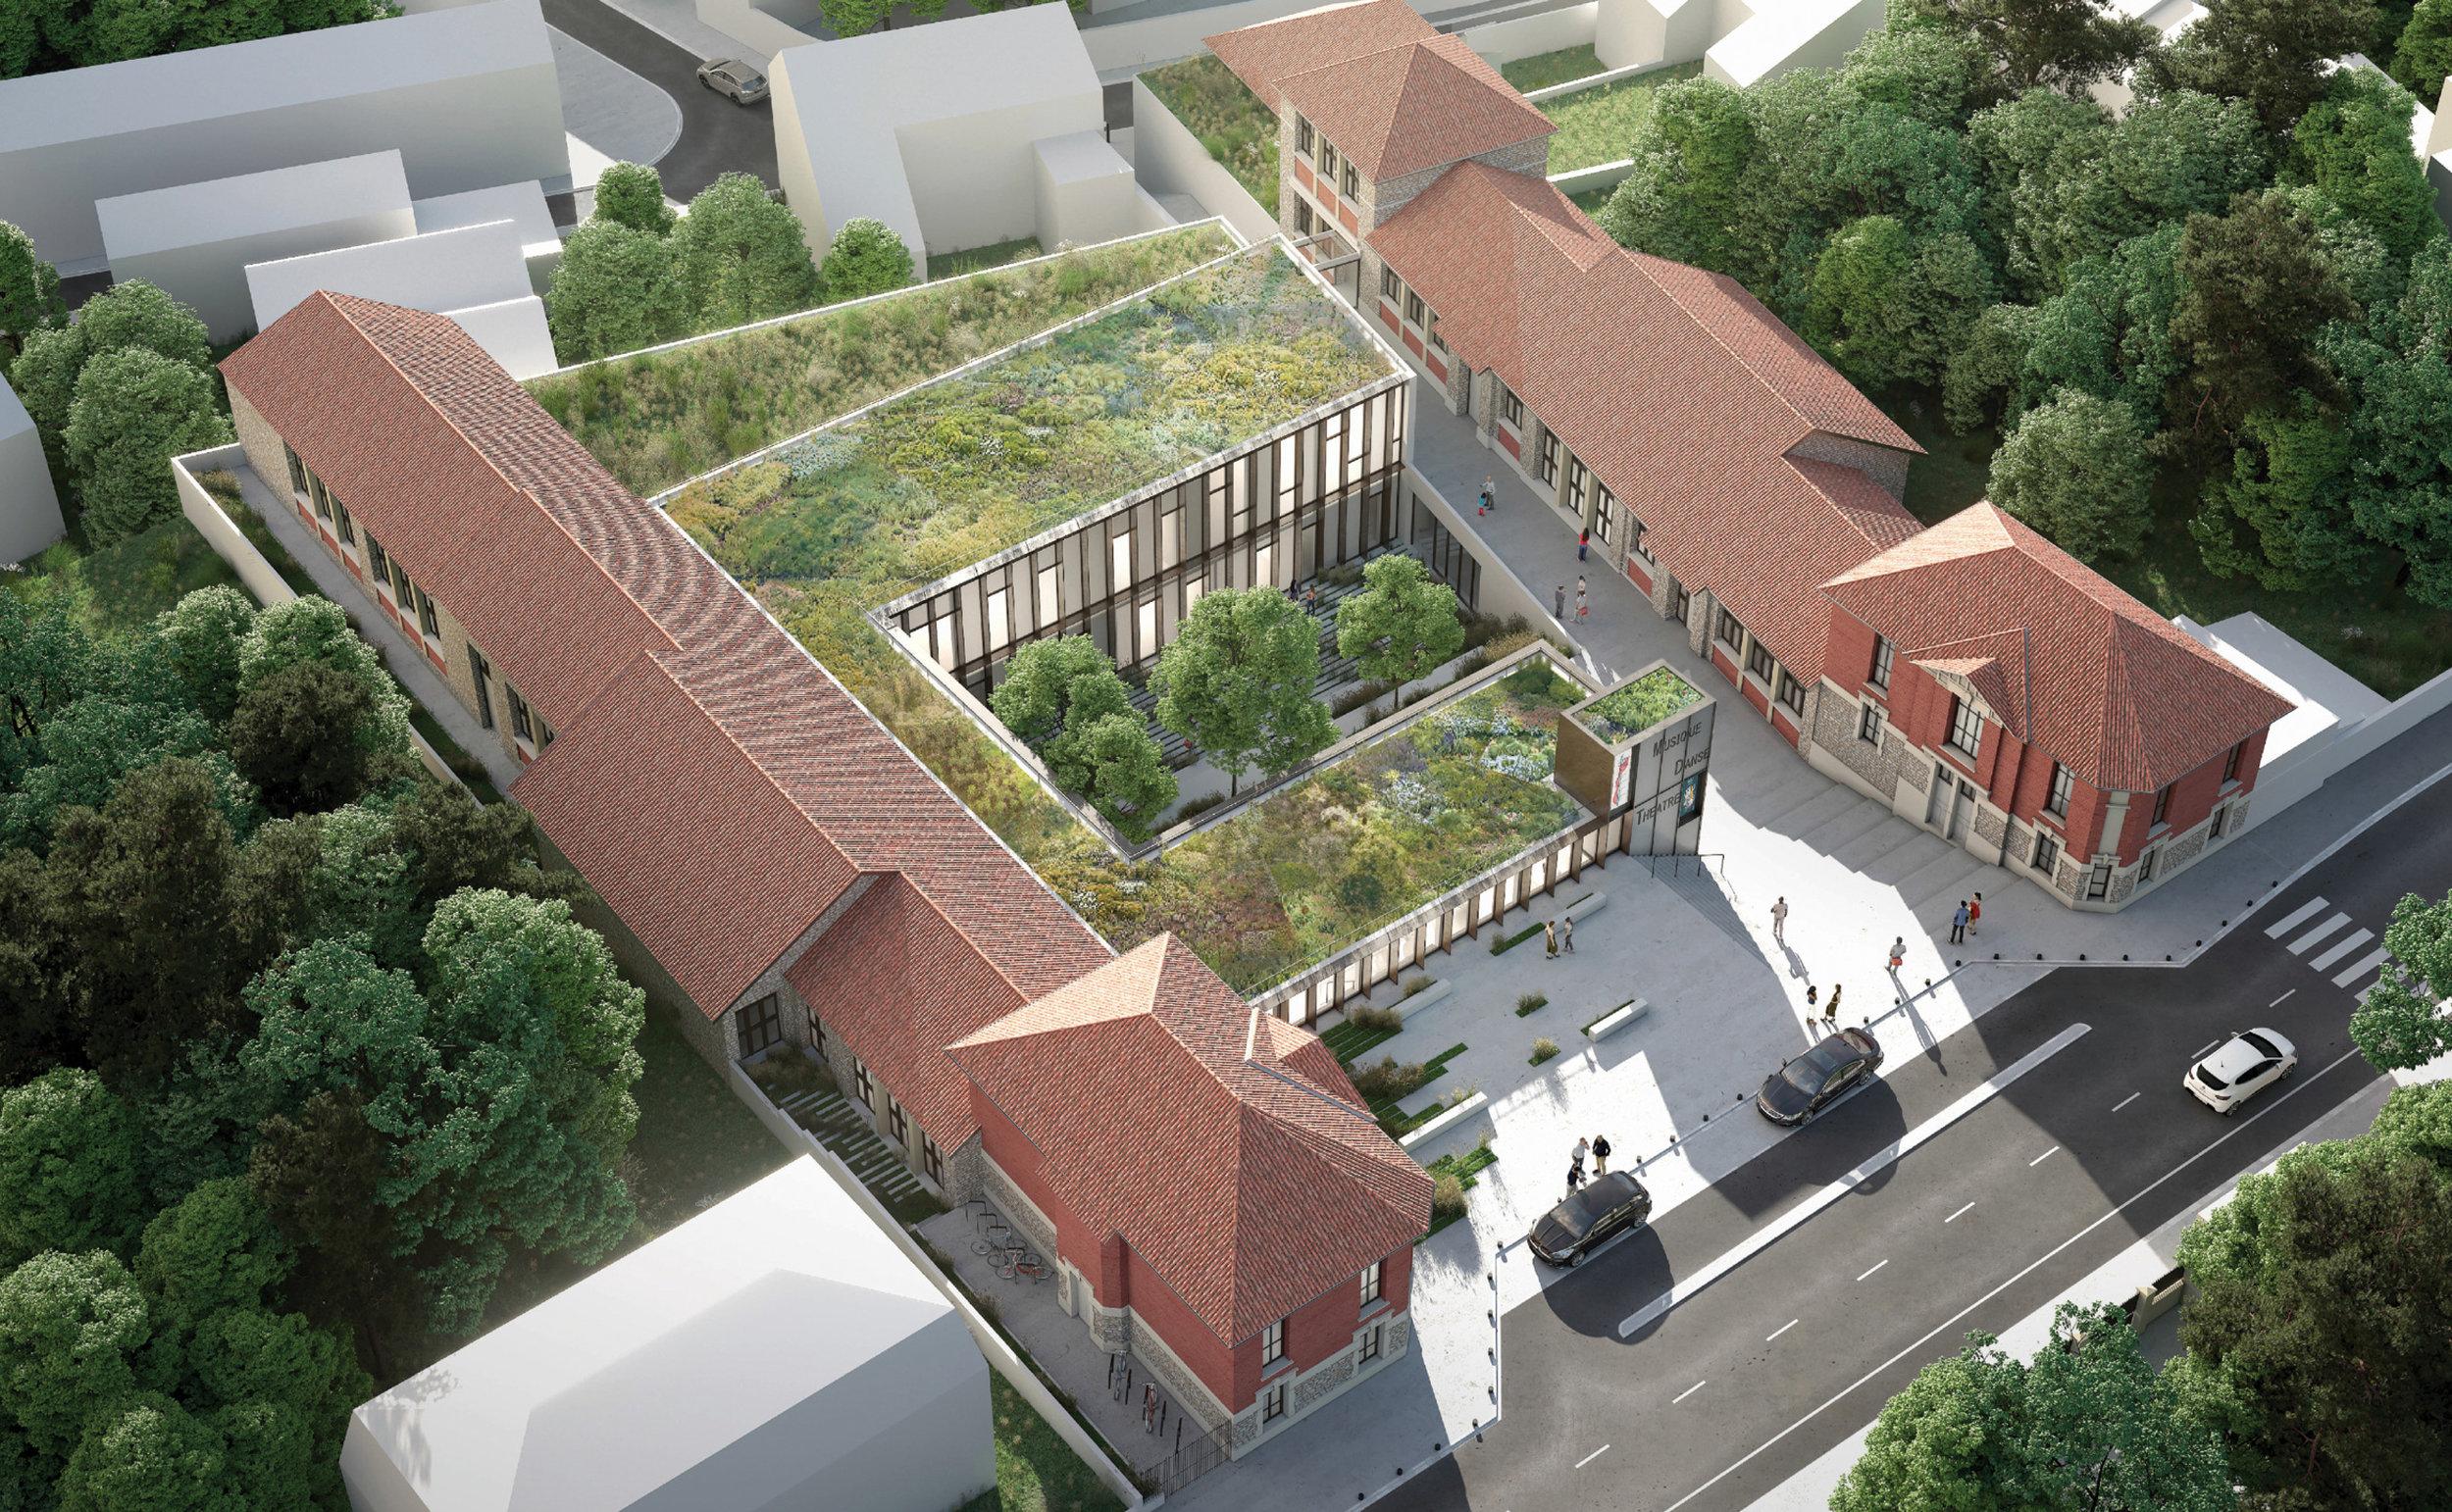 palaiseau_conservatory_public_outdoor_design_christophe_gautrand_landscape_2.jpg